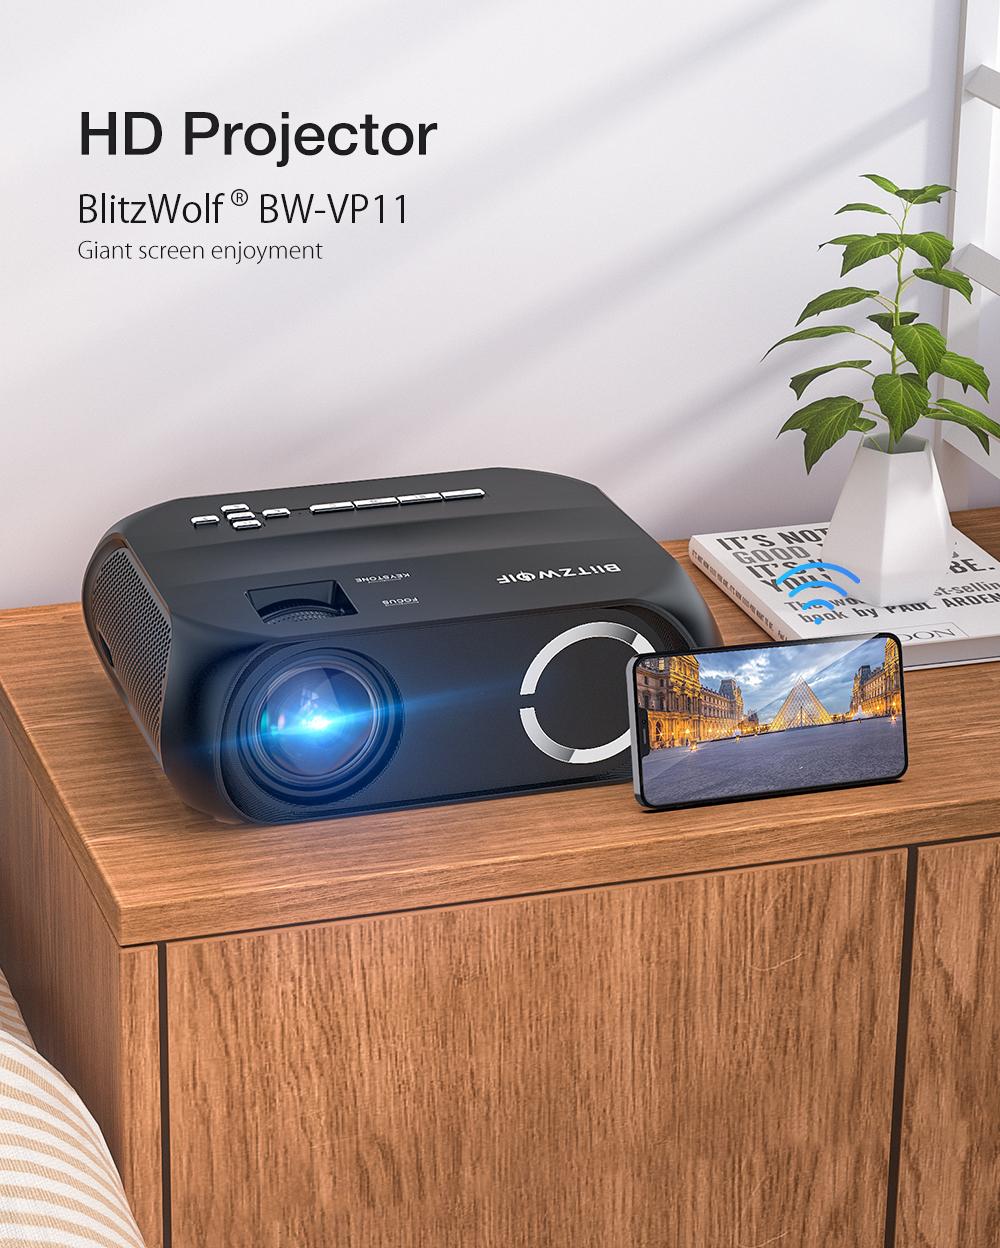 Blitzwolf BW-VP11 wifi projector